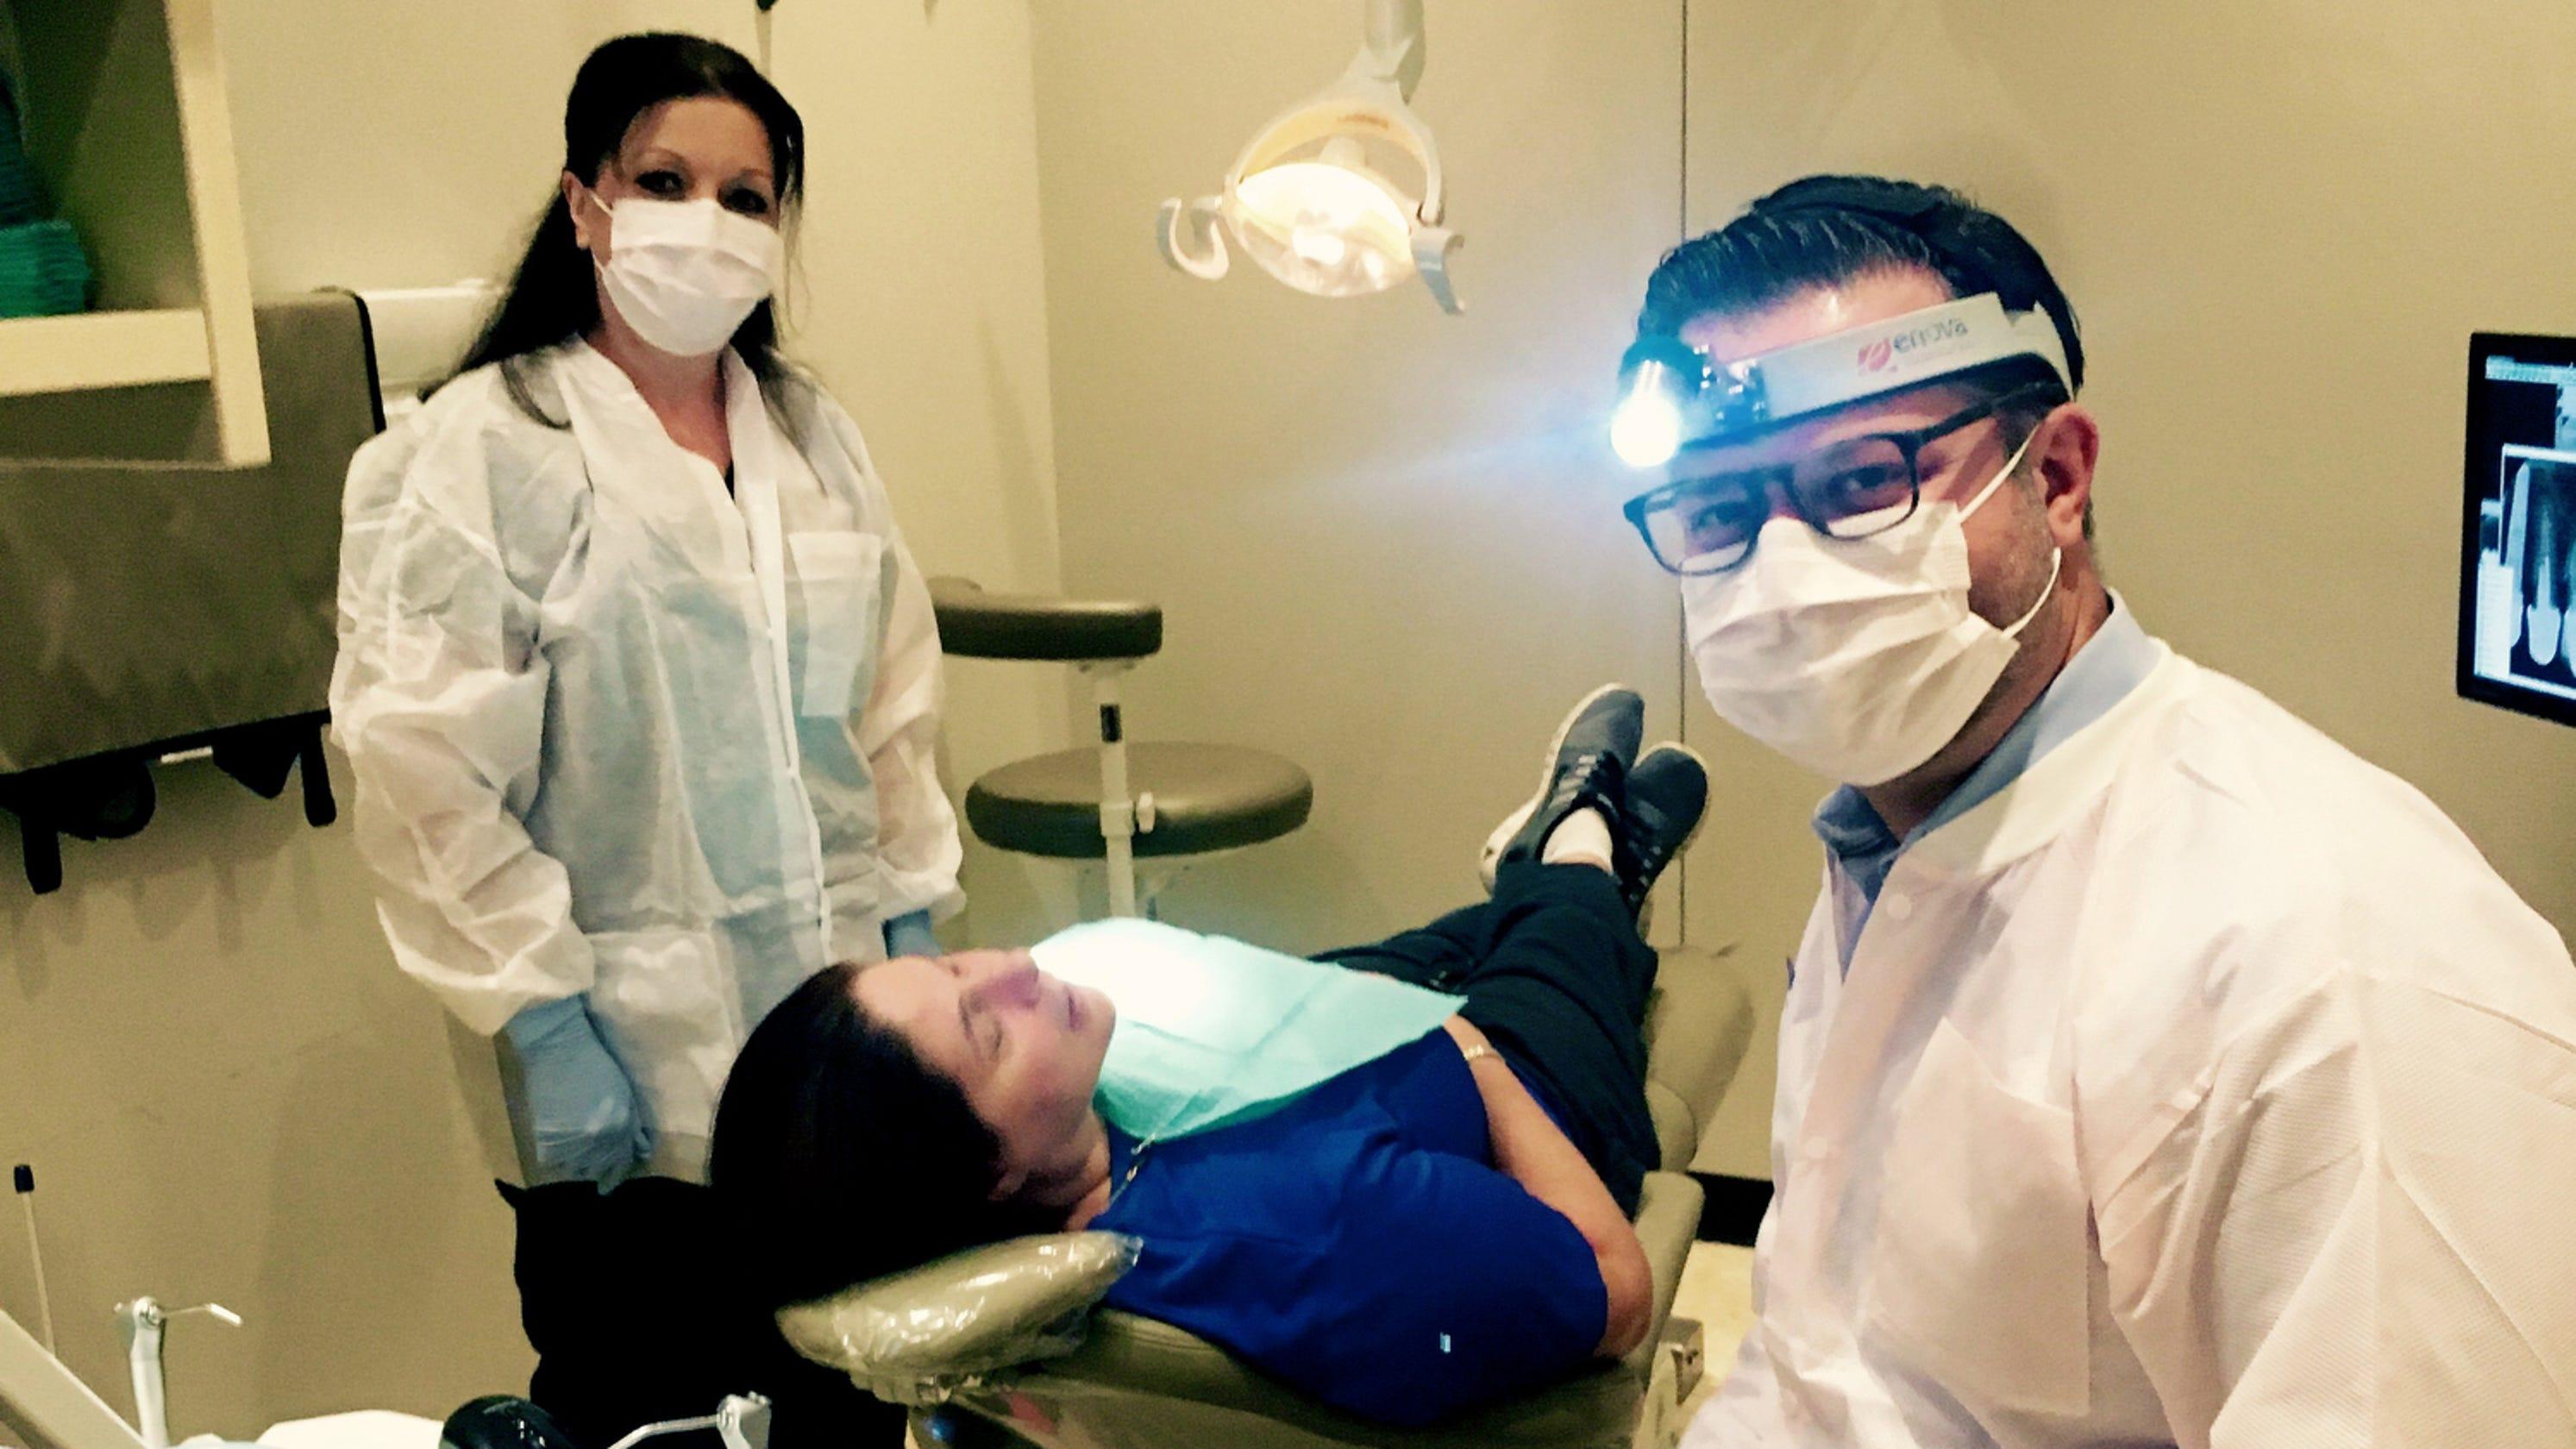 No dental insurance? Nashville clinics offer free or